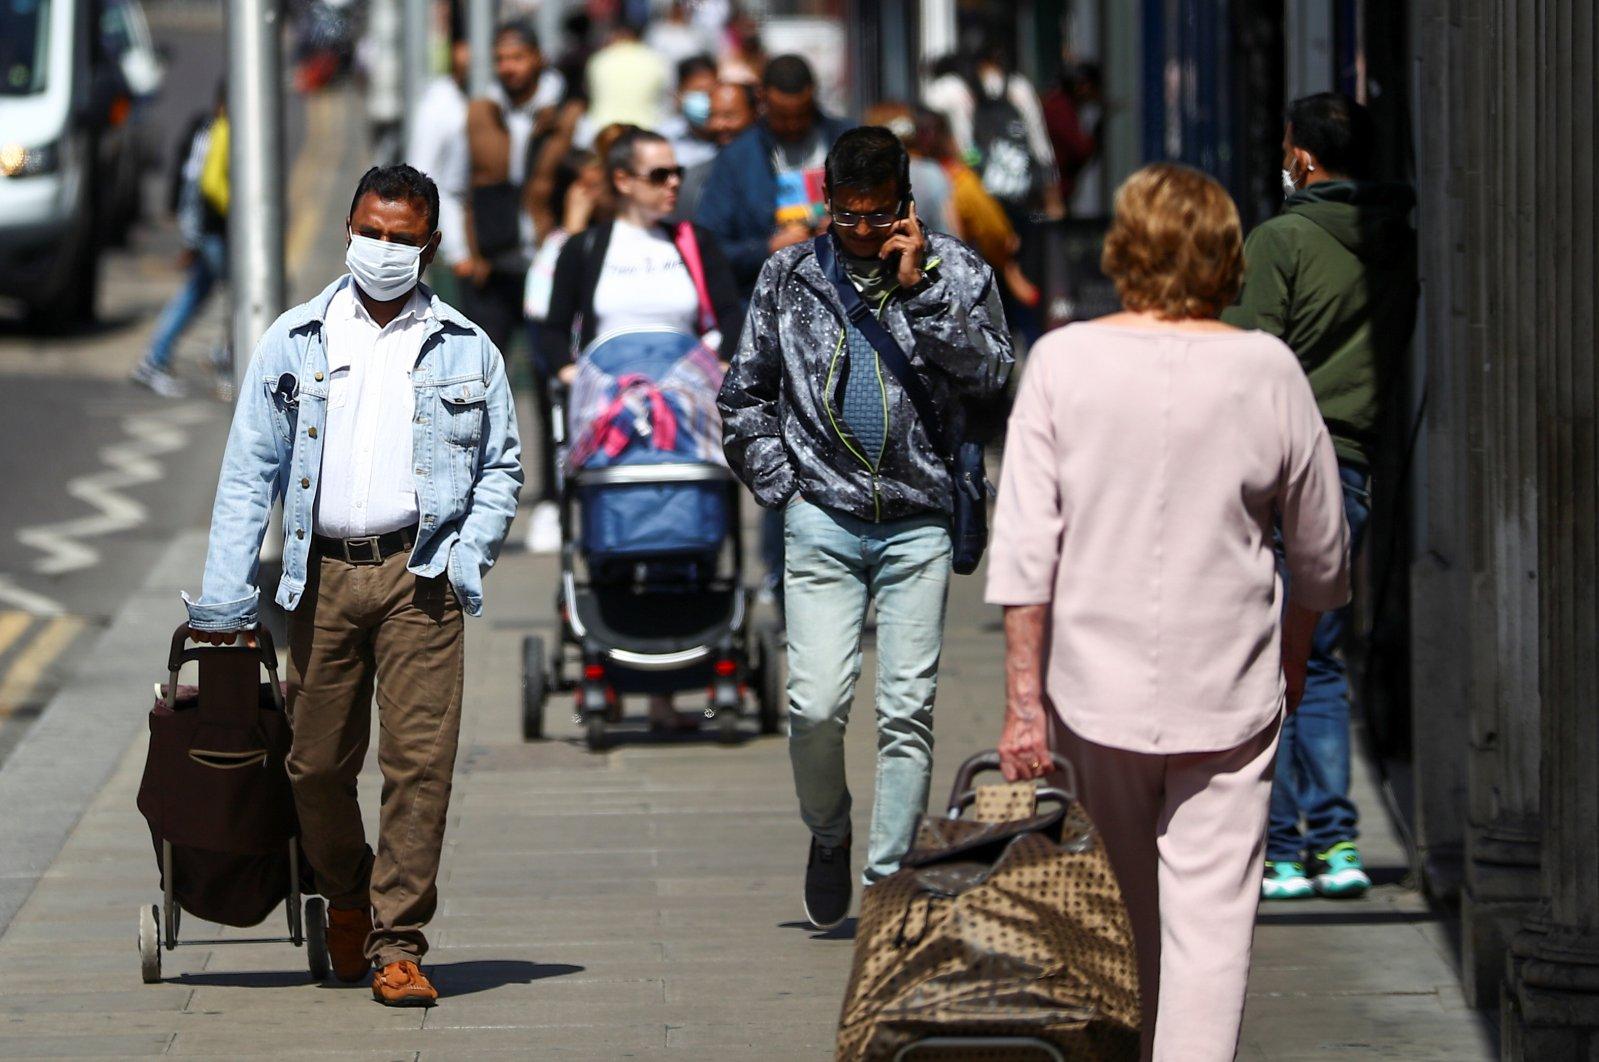 People walk down a street following the coronavirus outbreak, London, Britain, July 29, 2020. (Reuters Photo)